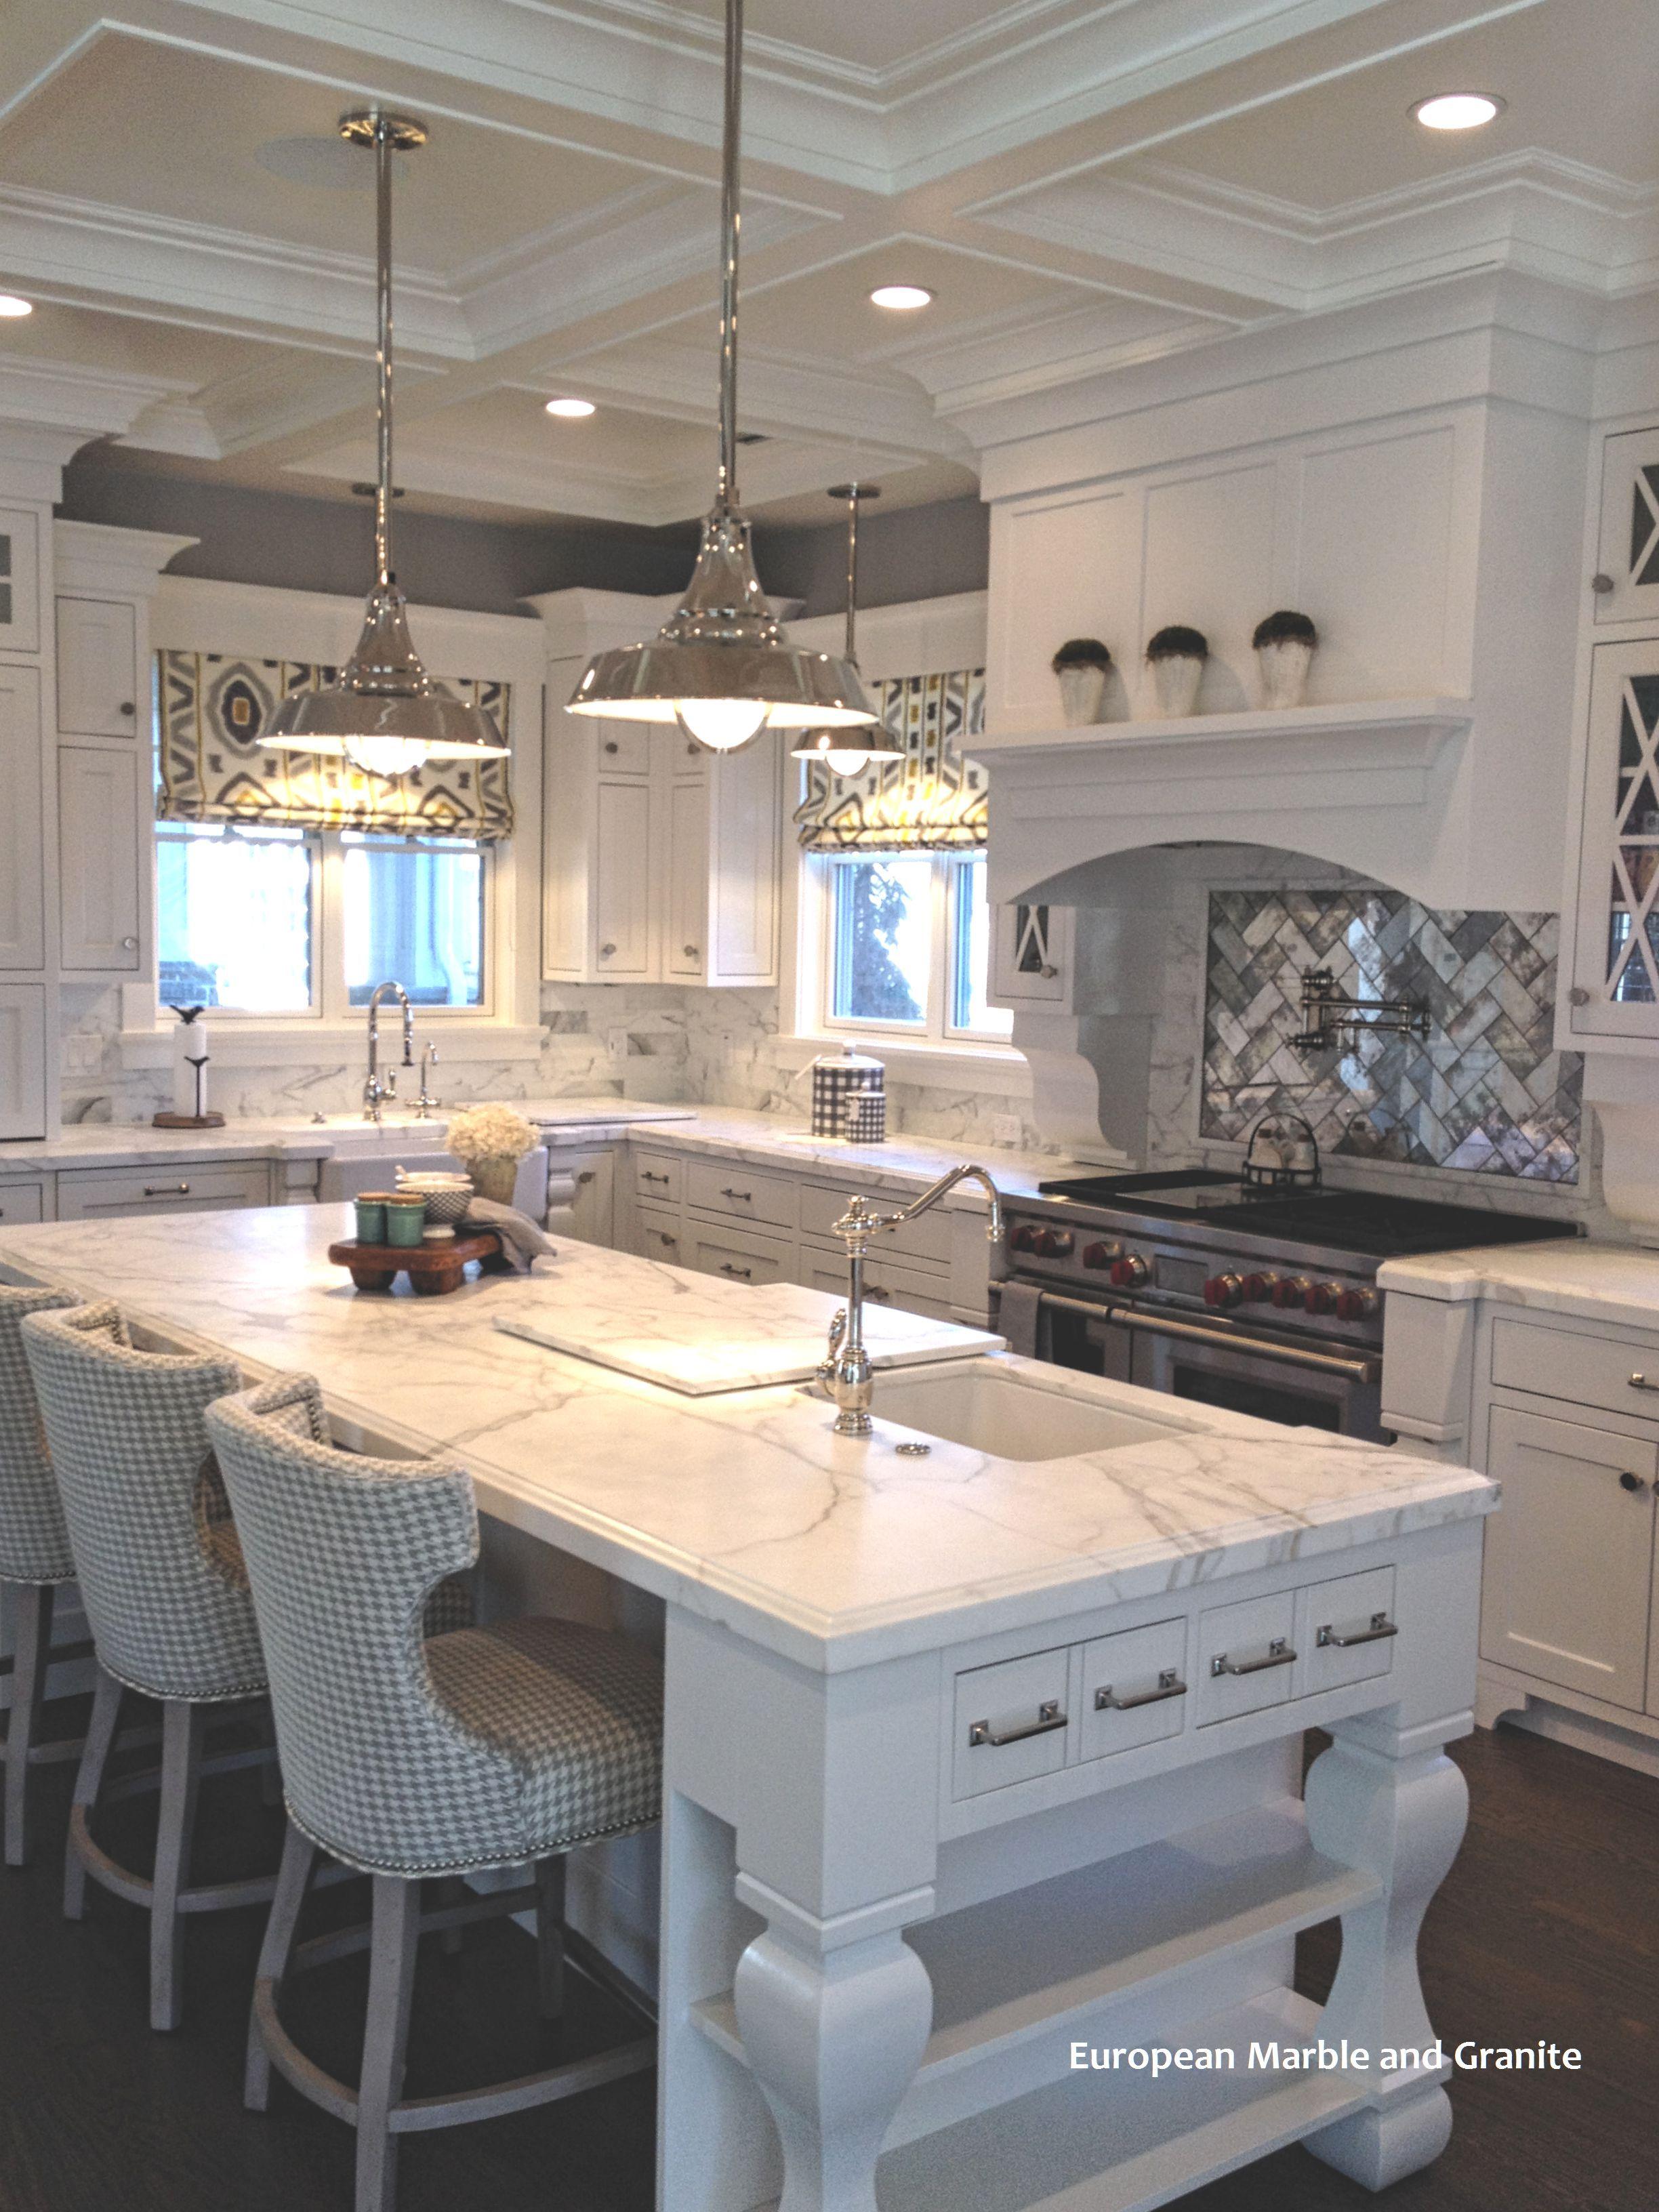 Antique And Mirrored Tile Backsplash Ideas White Kitchen